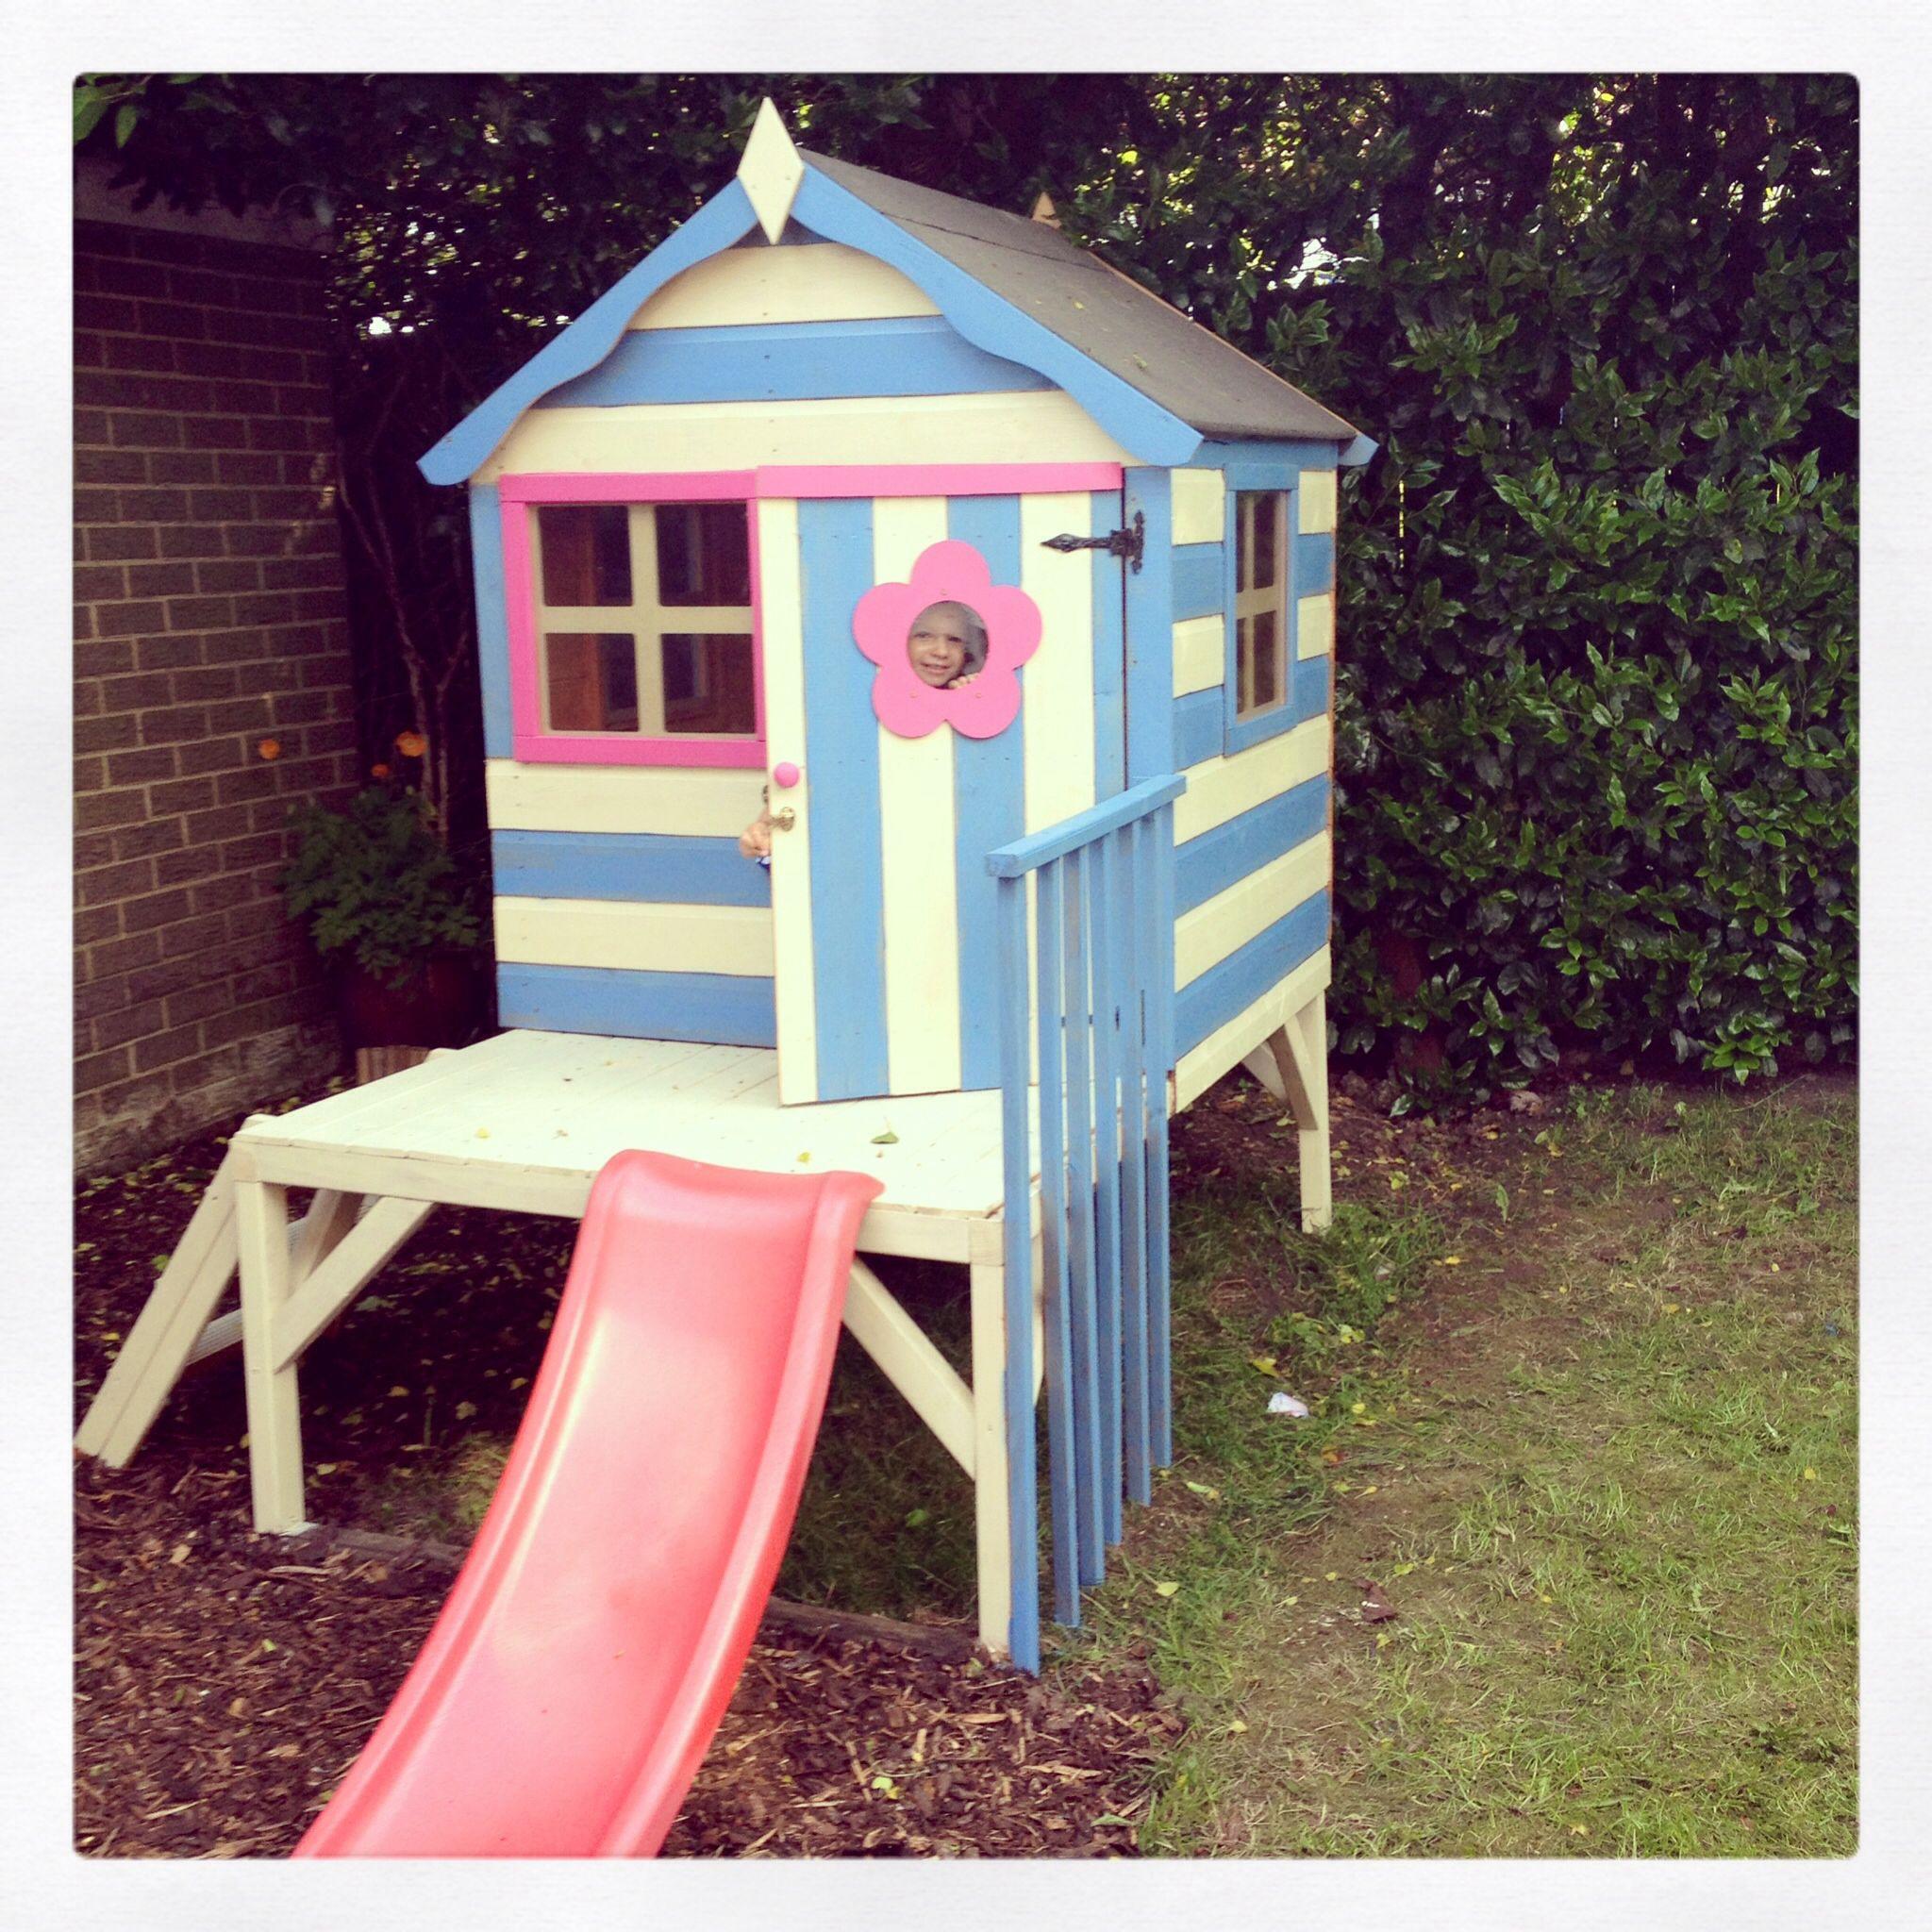 Beach hut playhouse playhouse decor ideas pinterest for Beach hut design ideas